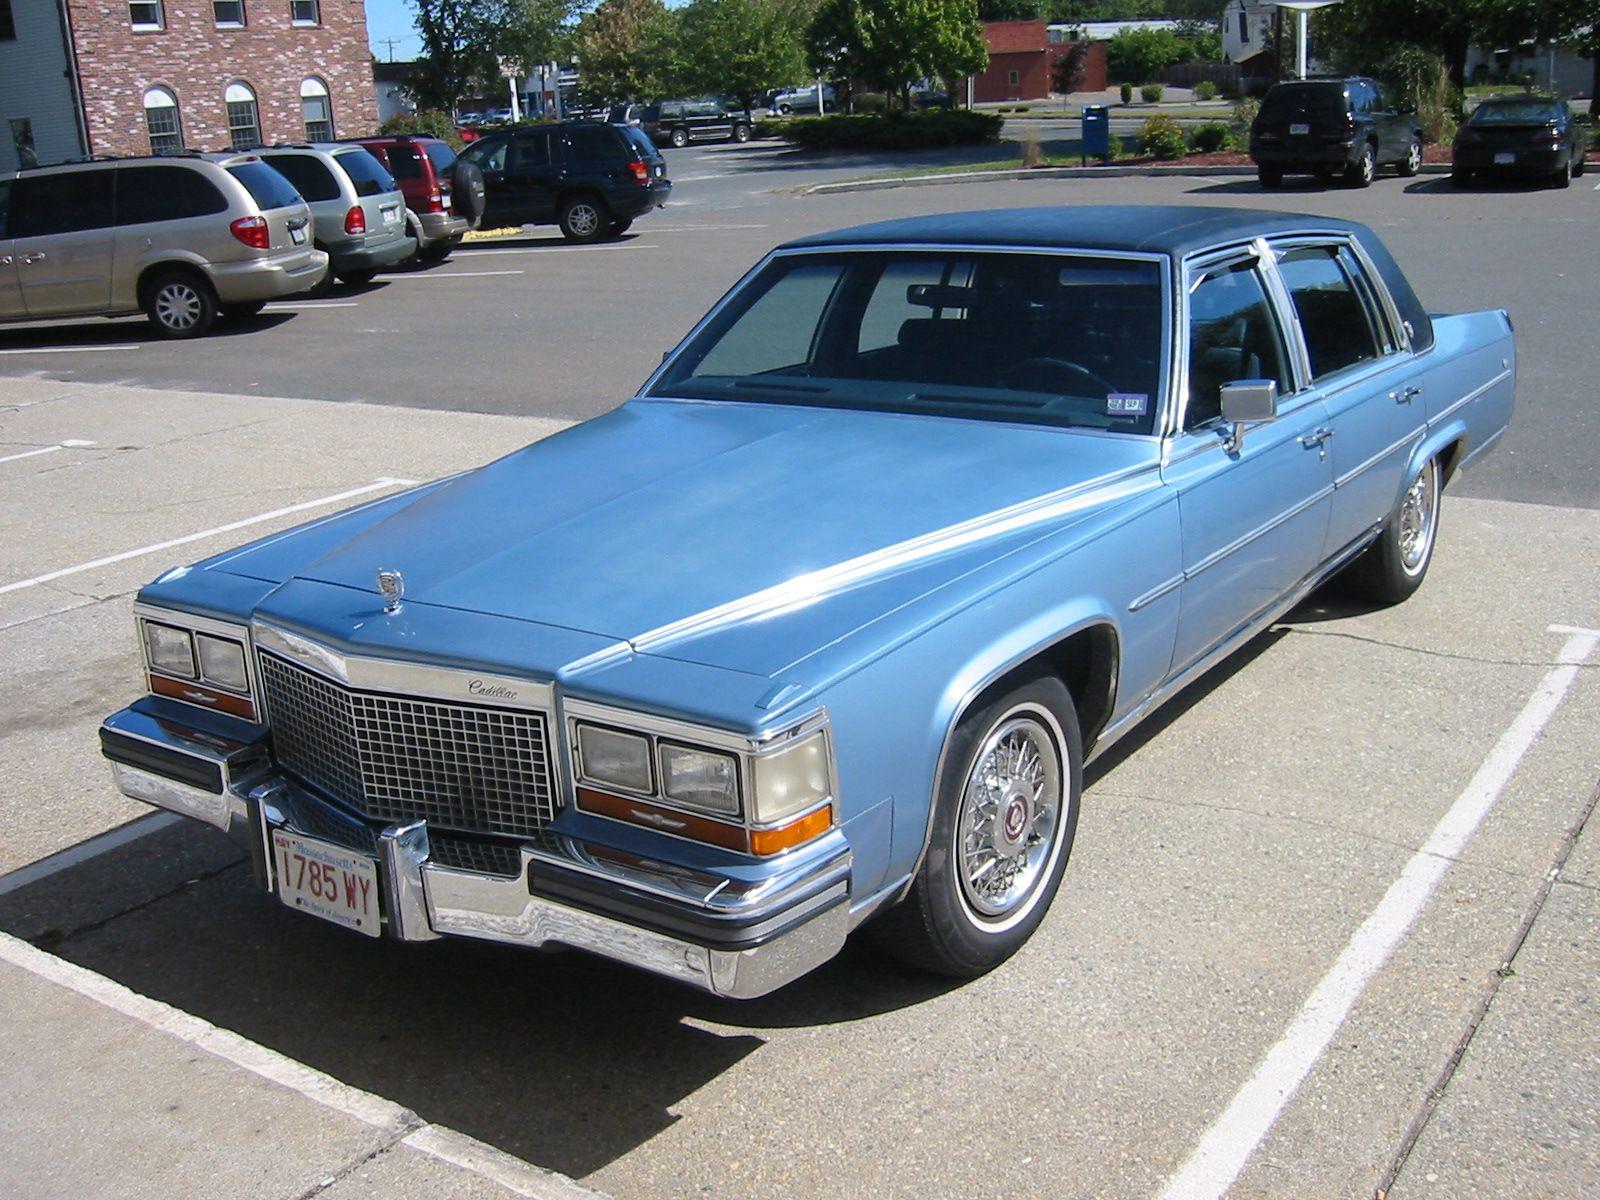 1988 Cadillac Fleetwood Brougham | Cadillac-Fleetwood | Pinterest